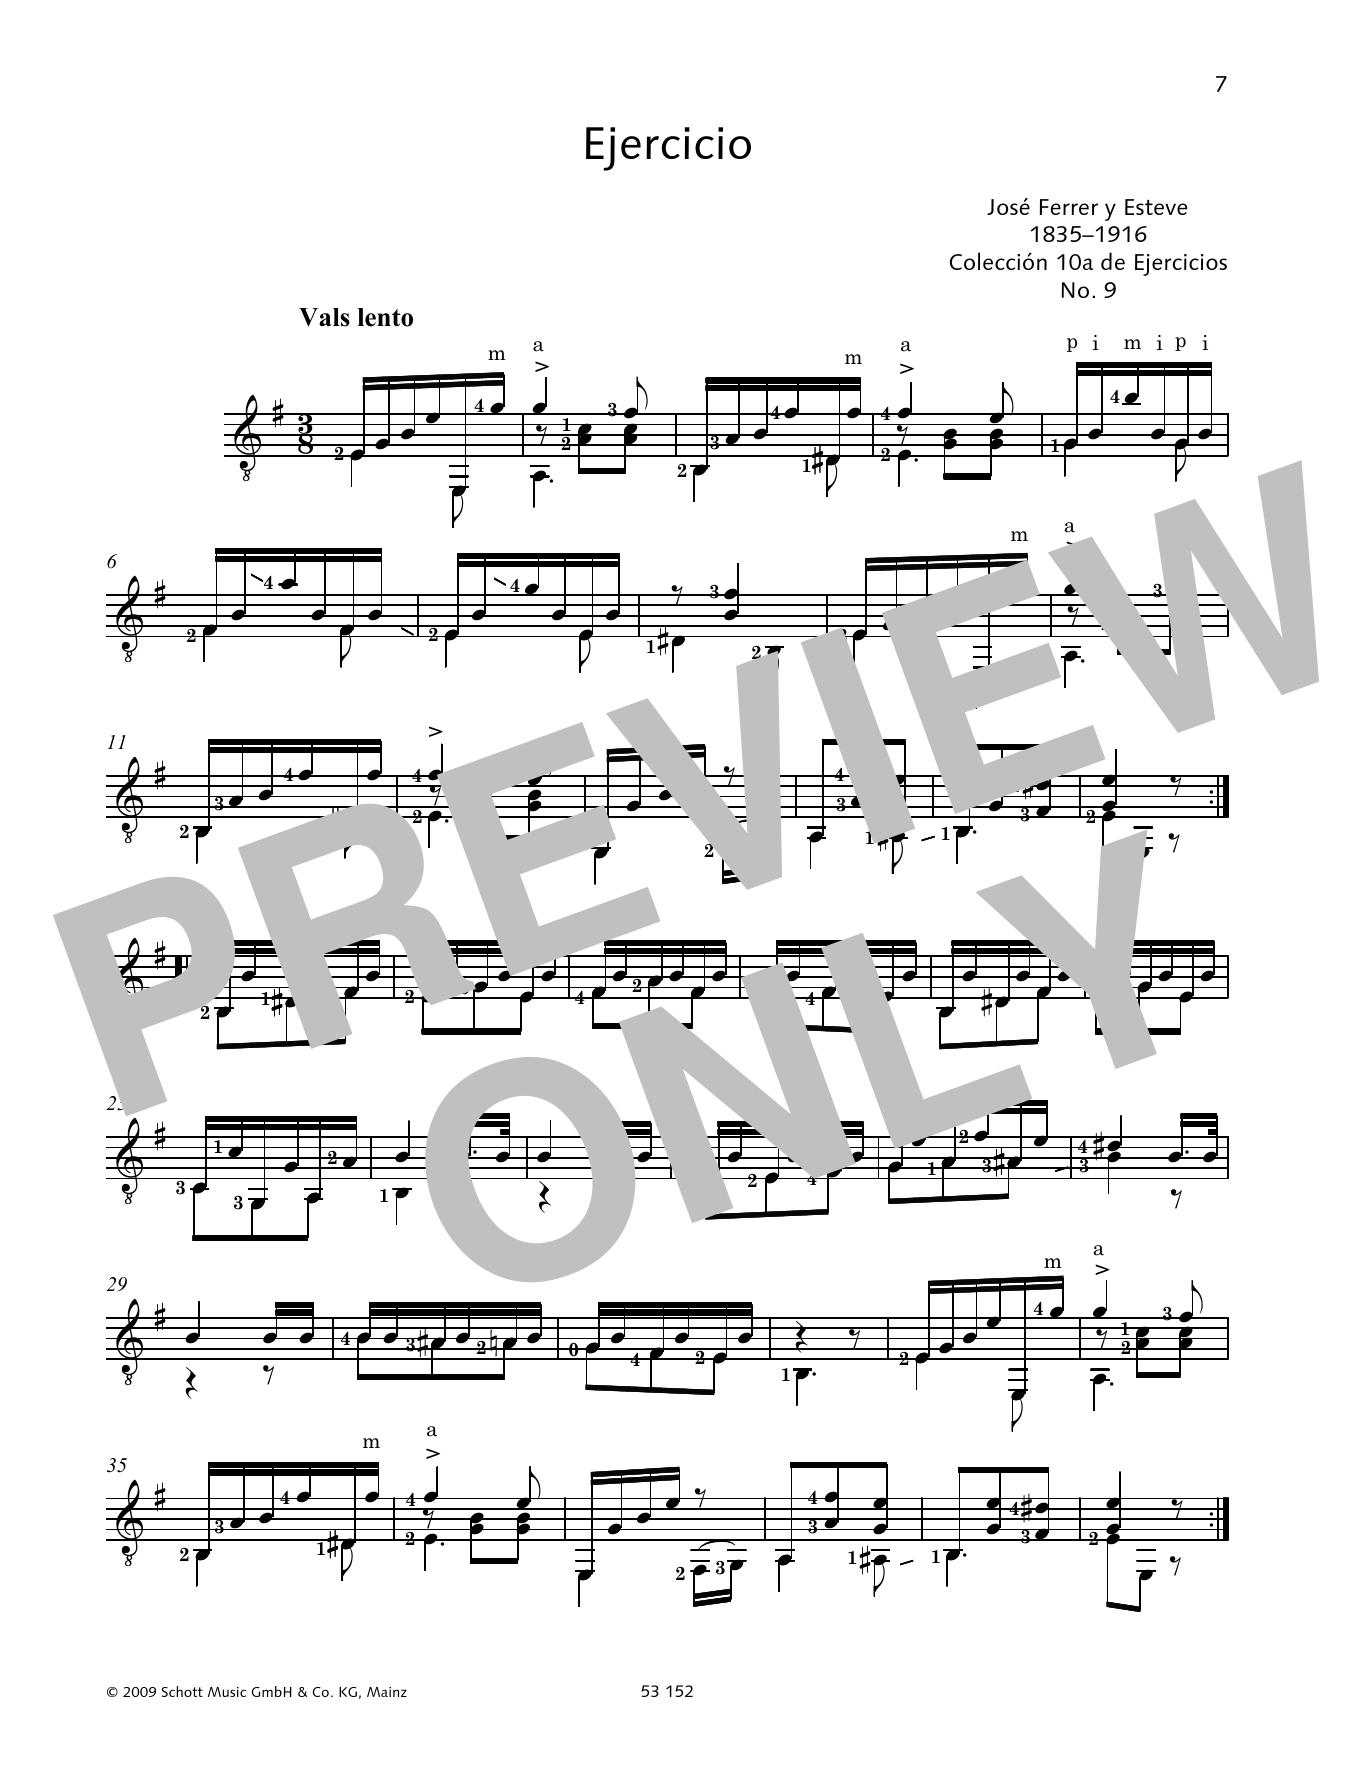 Ejercicio Sheet Music